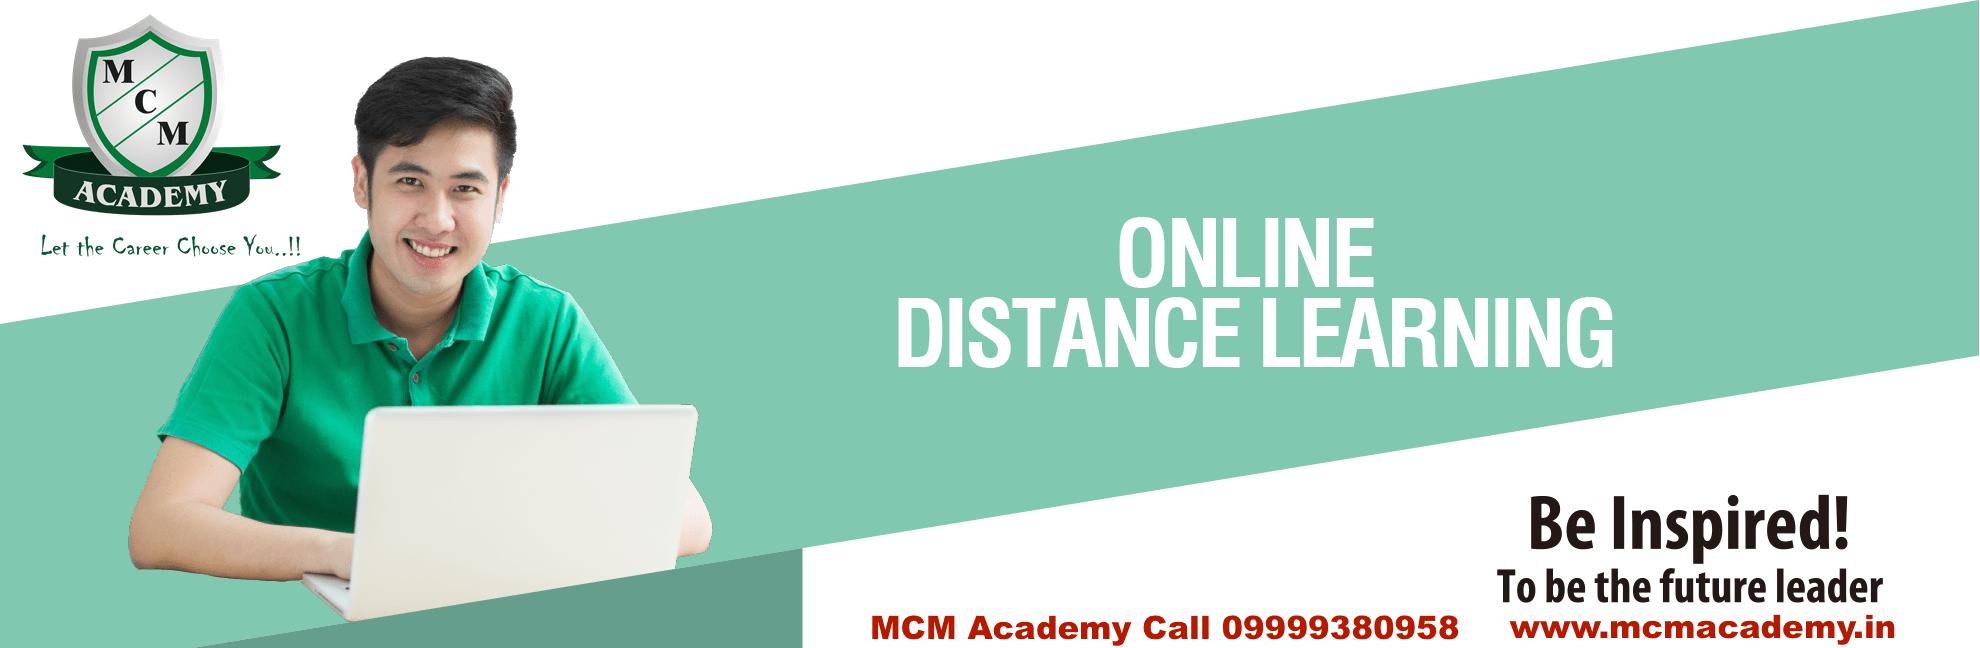 mcm academy distance courses